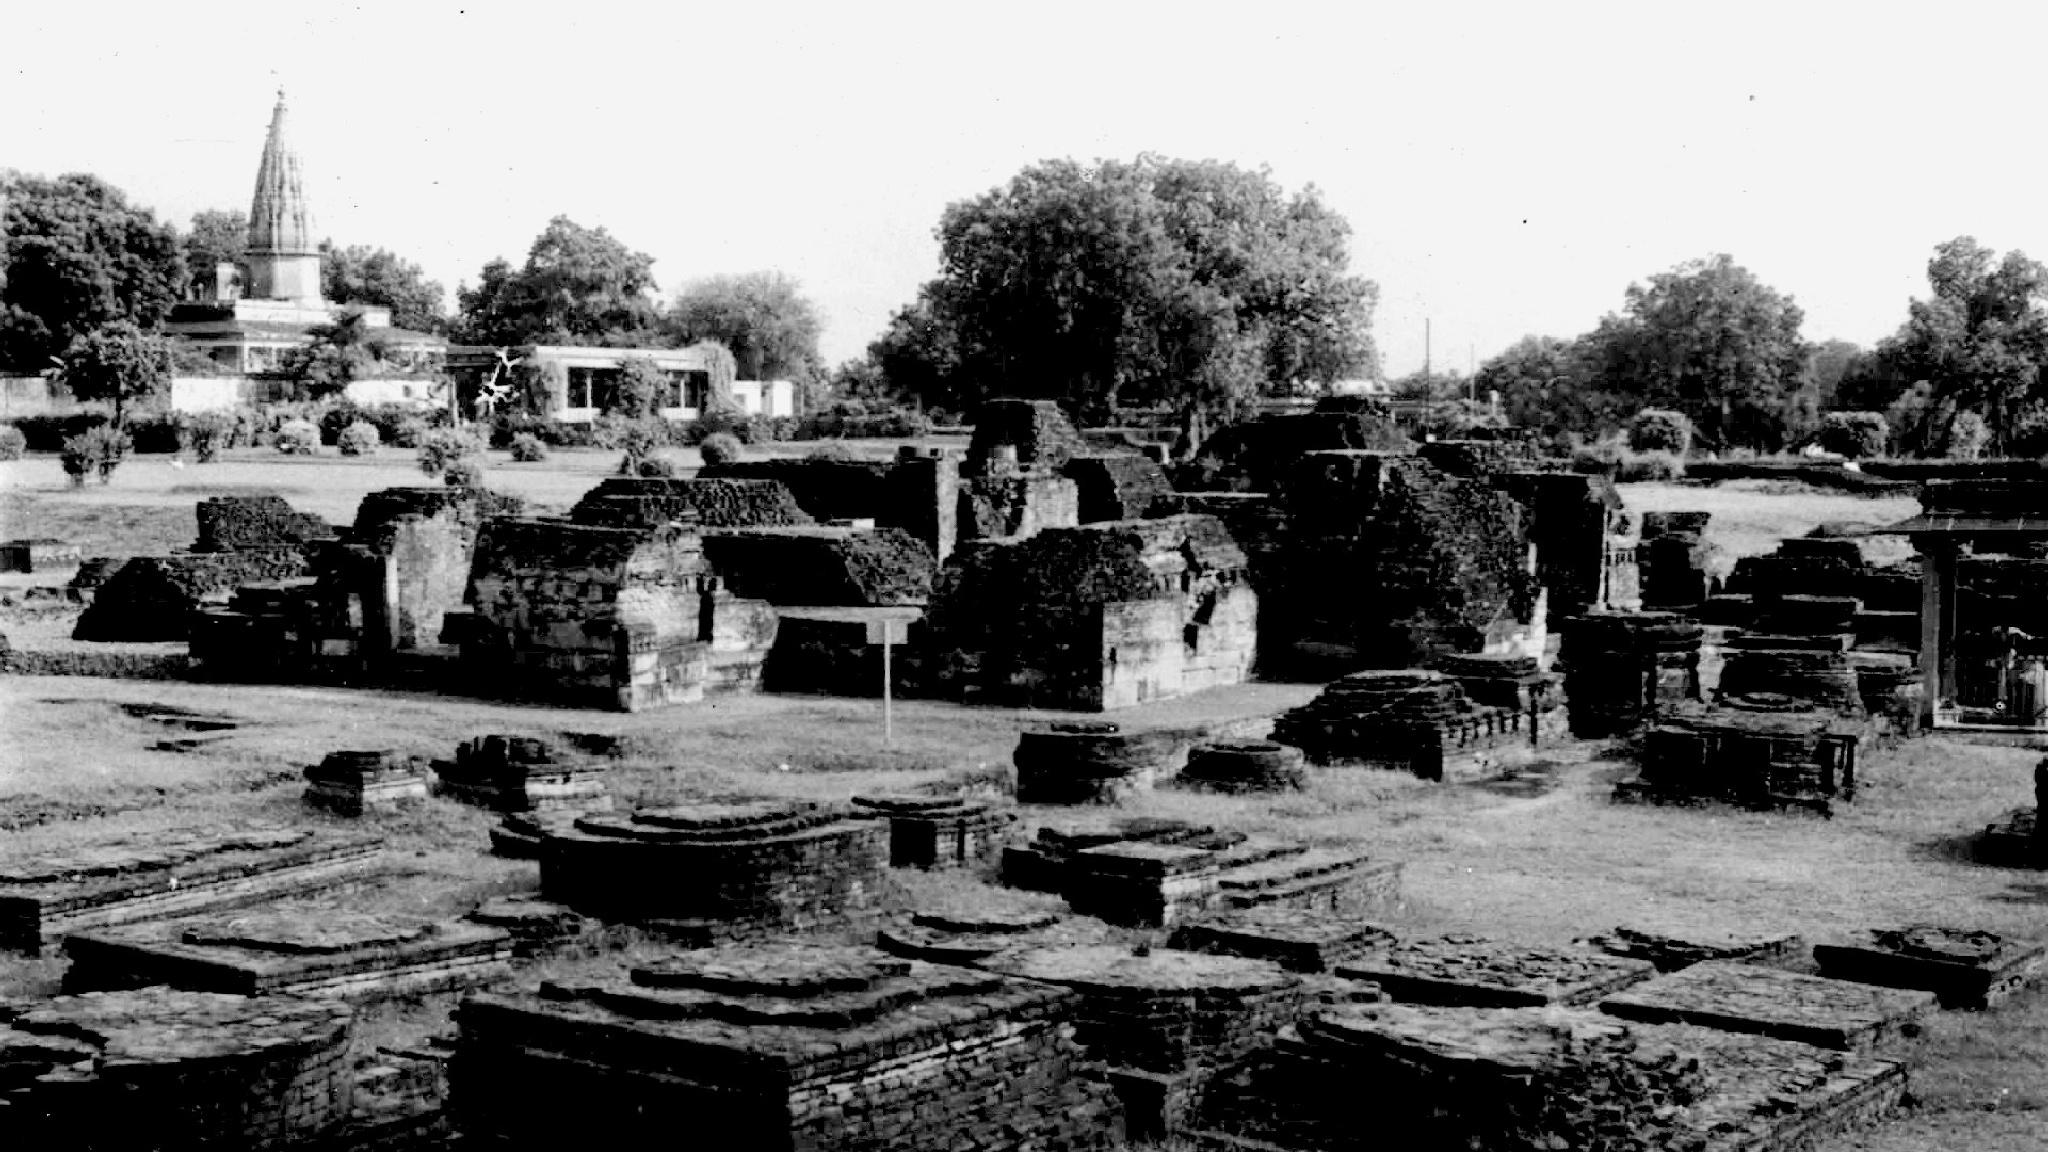 The lost Civilization - The Maurya Dynasty by Suresh Tewari